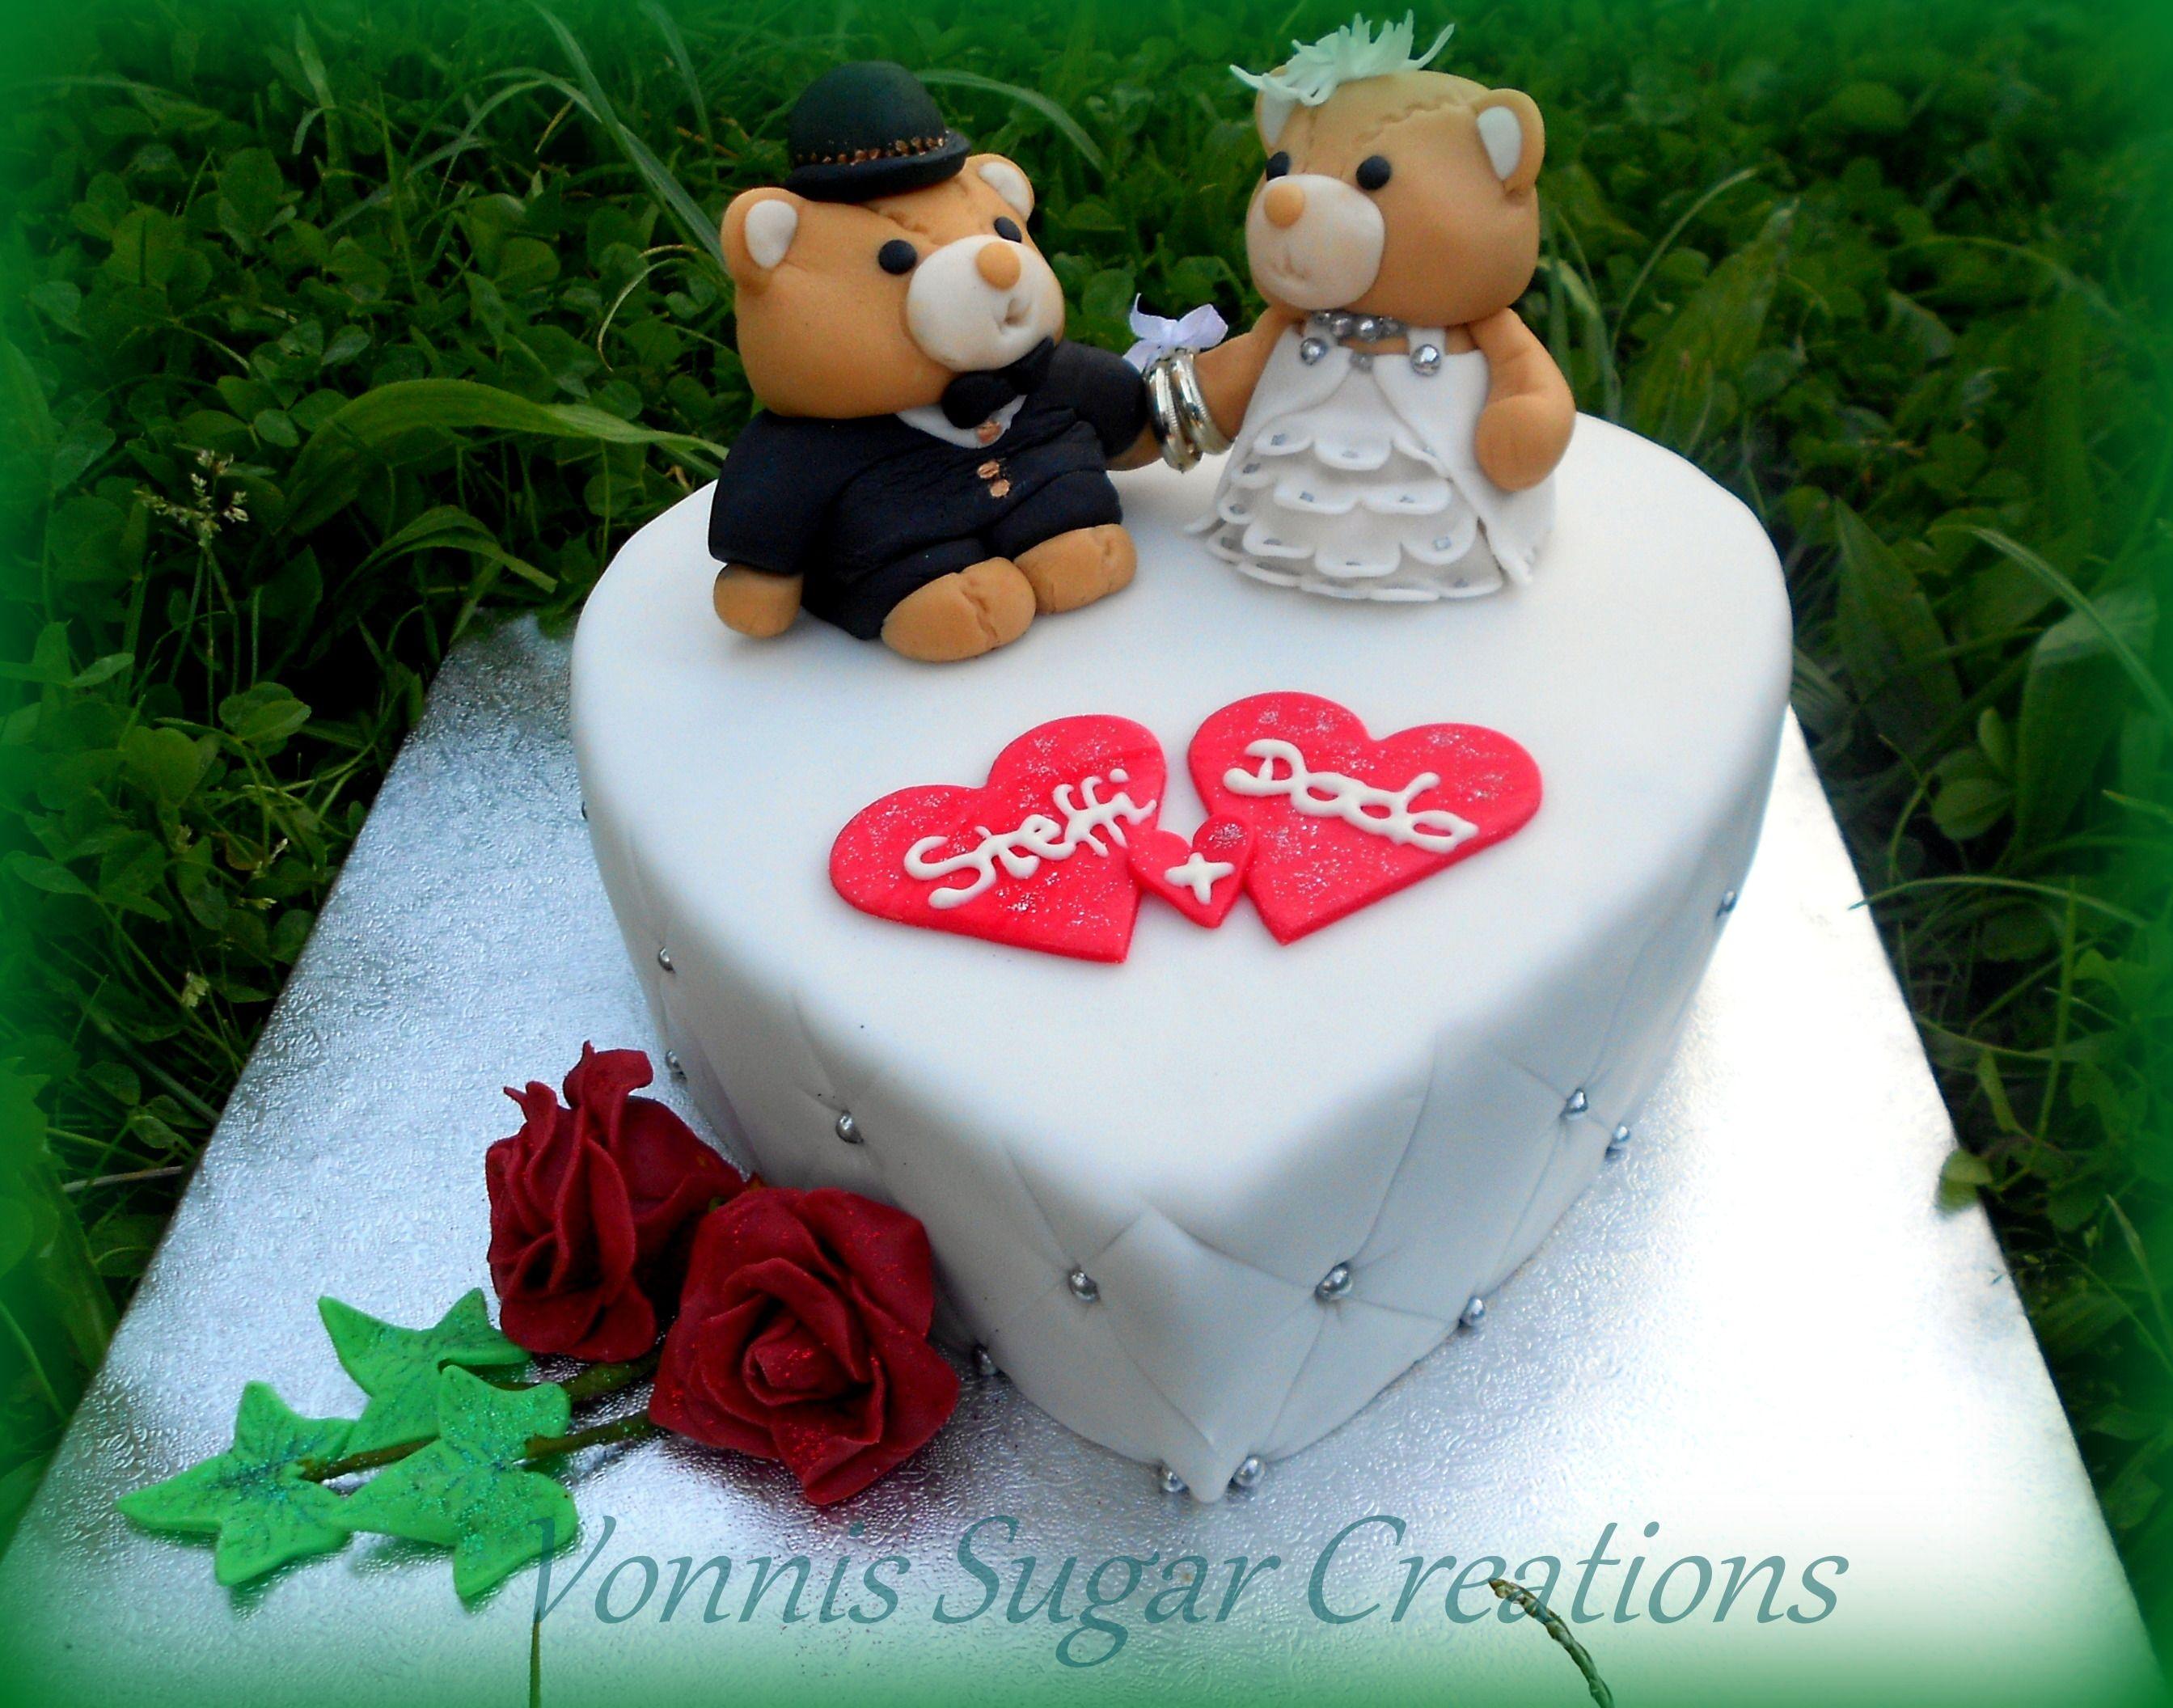 Small Wedding Cake Bears Heart Fondant Kleine Hochzeitstorte Herz